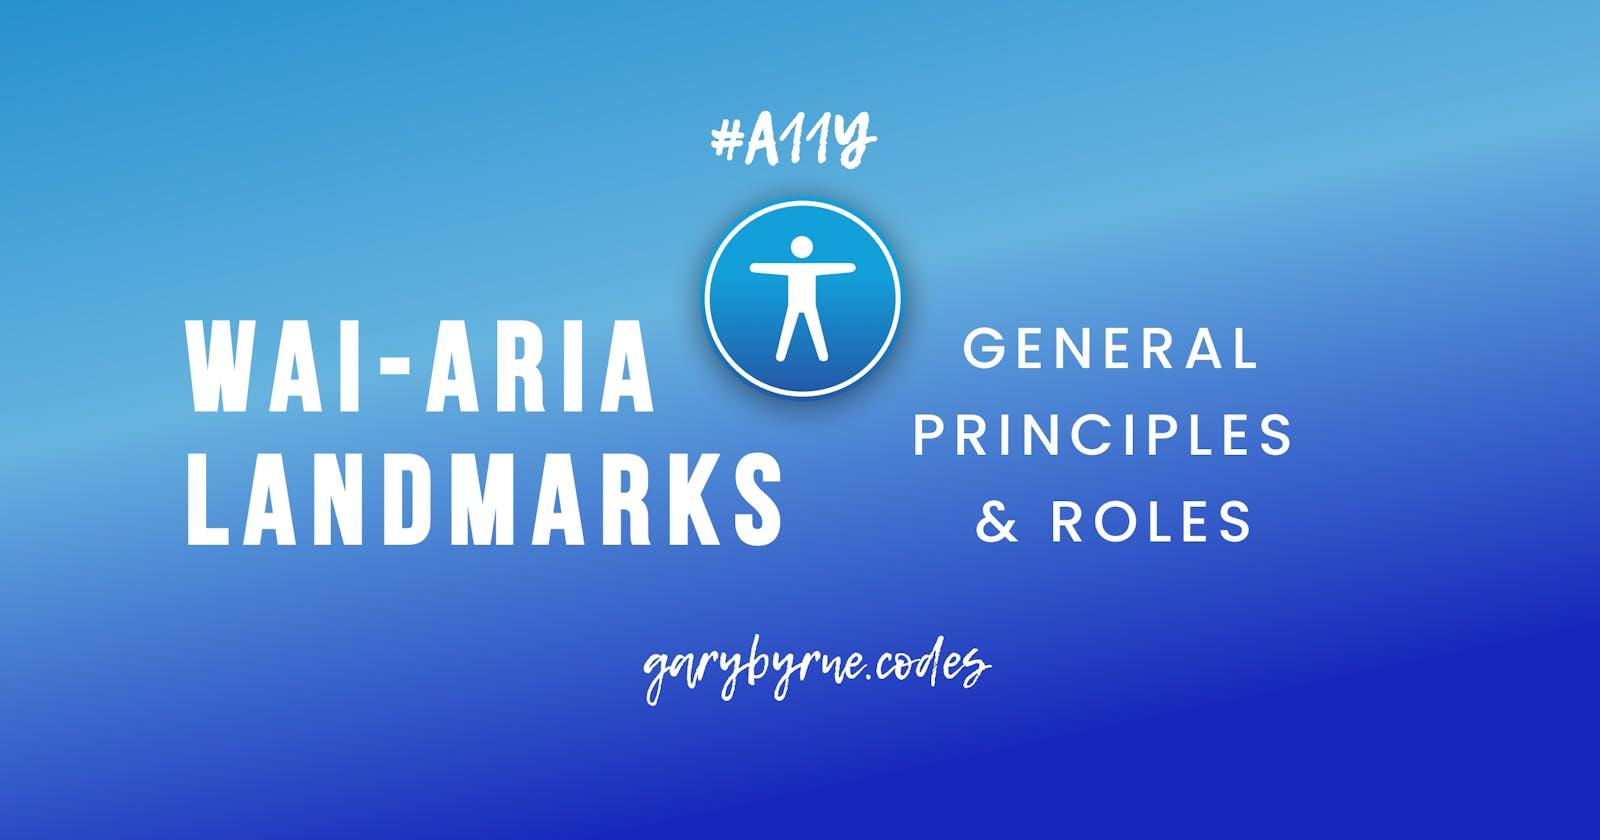 Understanding ARIA Landmarks - General Principles and Roles